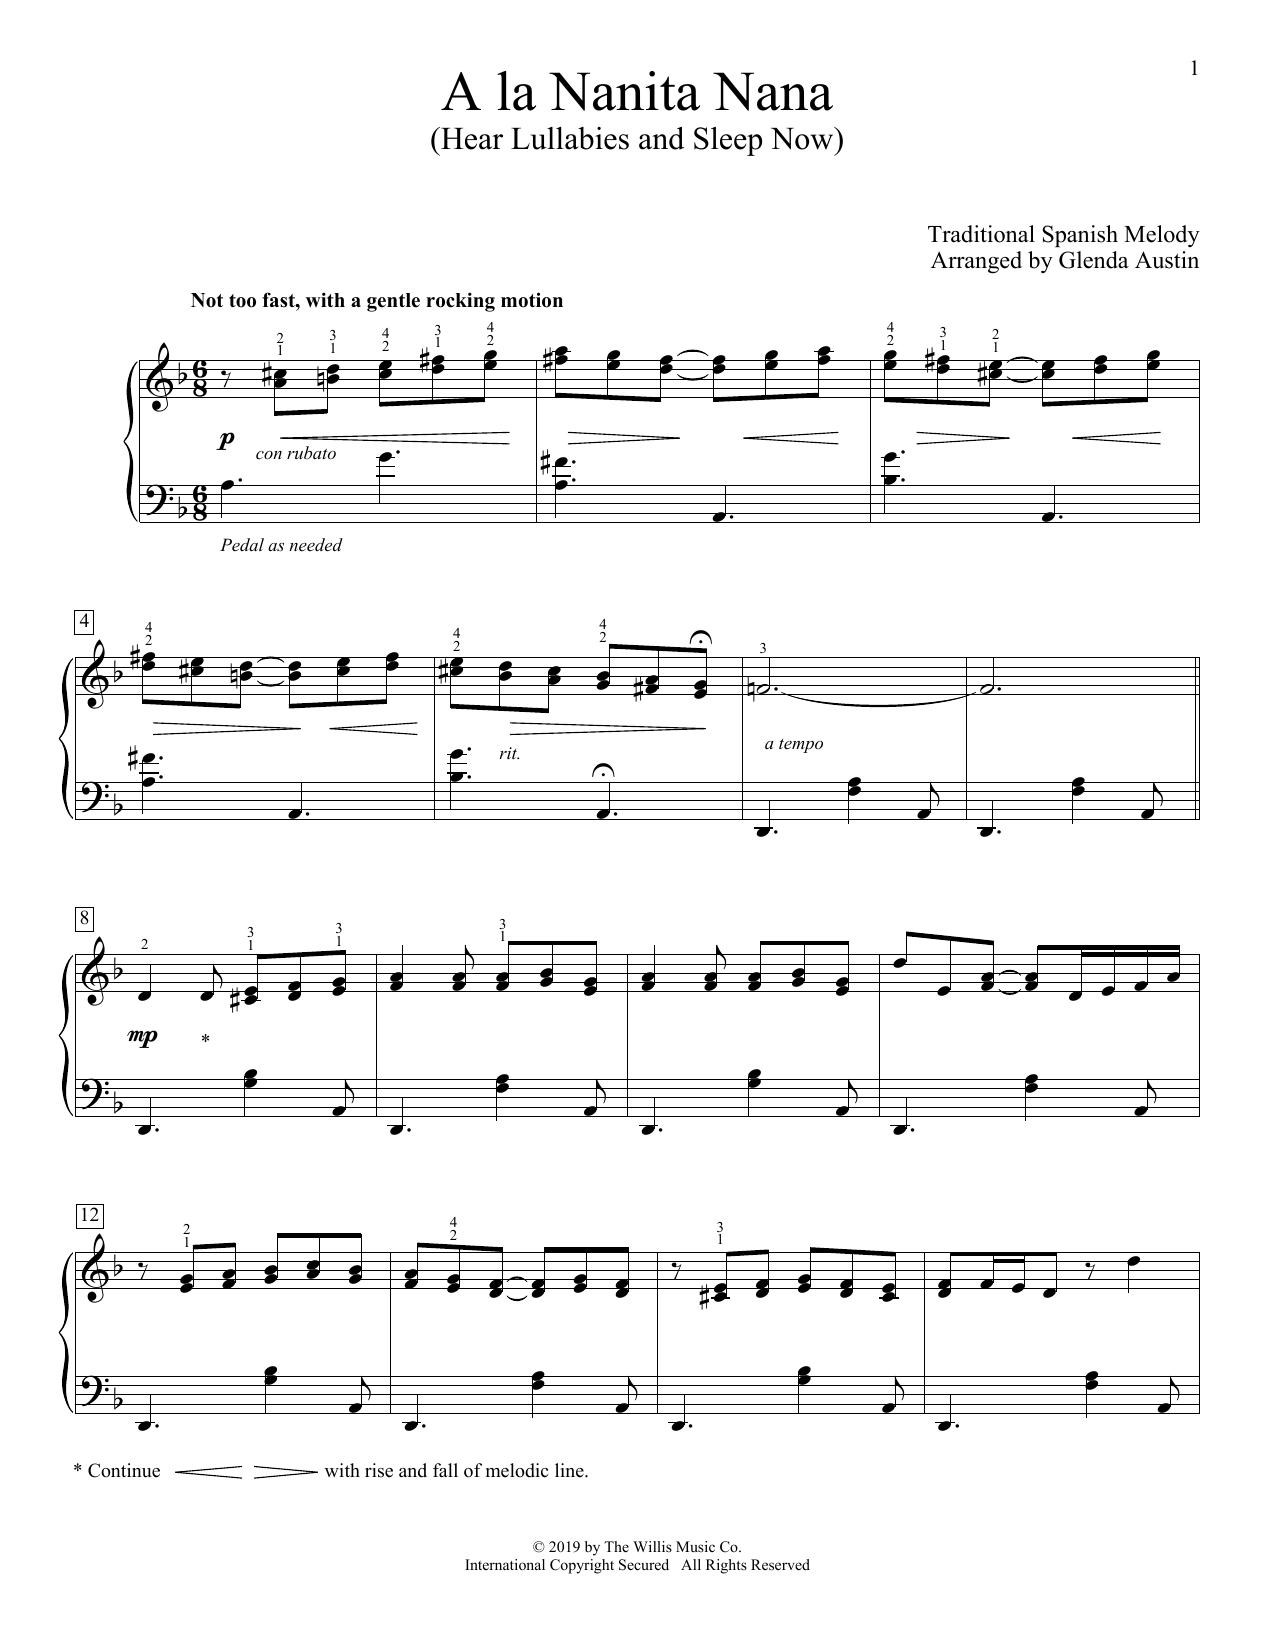 A La Nanita Nana (Hear Lullabies And Sleep Now) (arr. Glenda Austin) (Piano Solo)